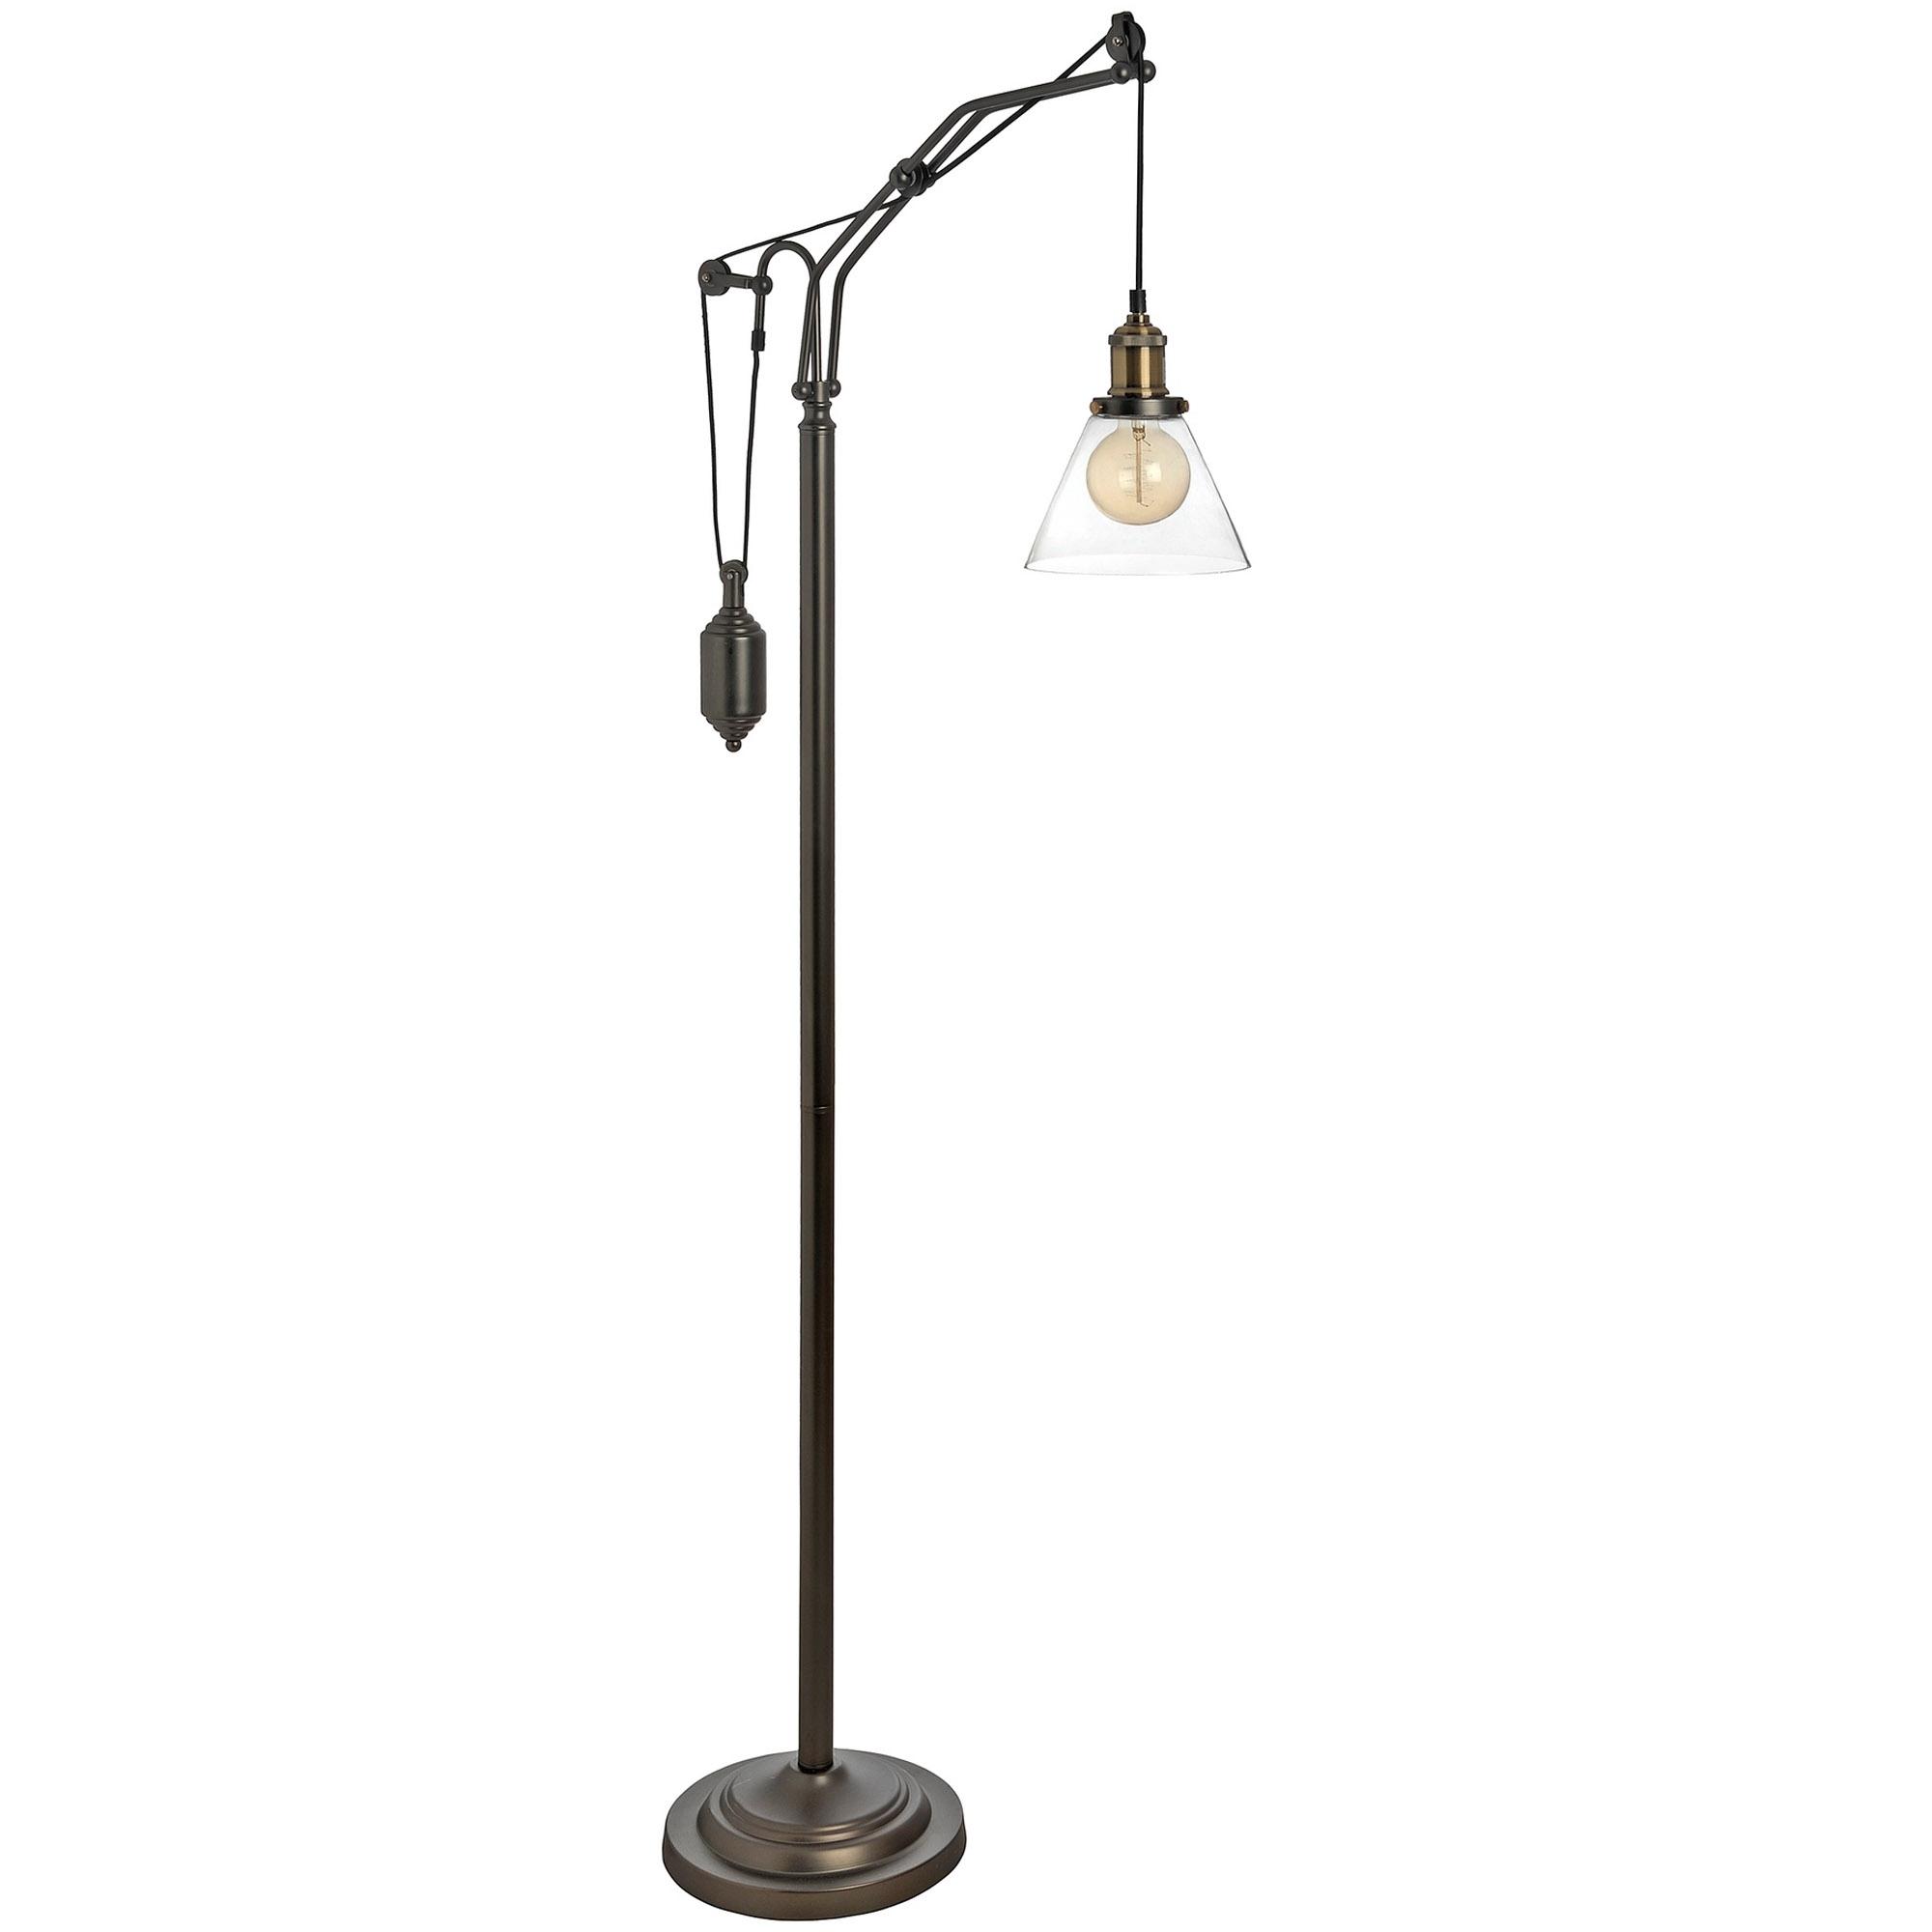 Hudson Adjustable Industrial Floor Lamp Homesdirect365